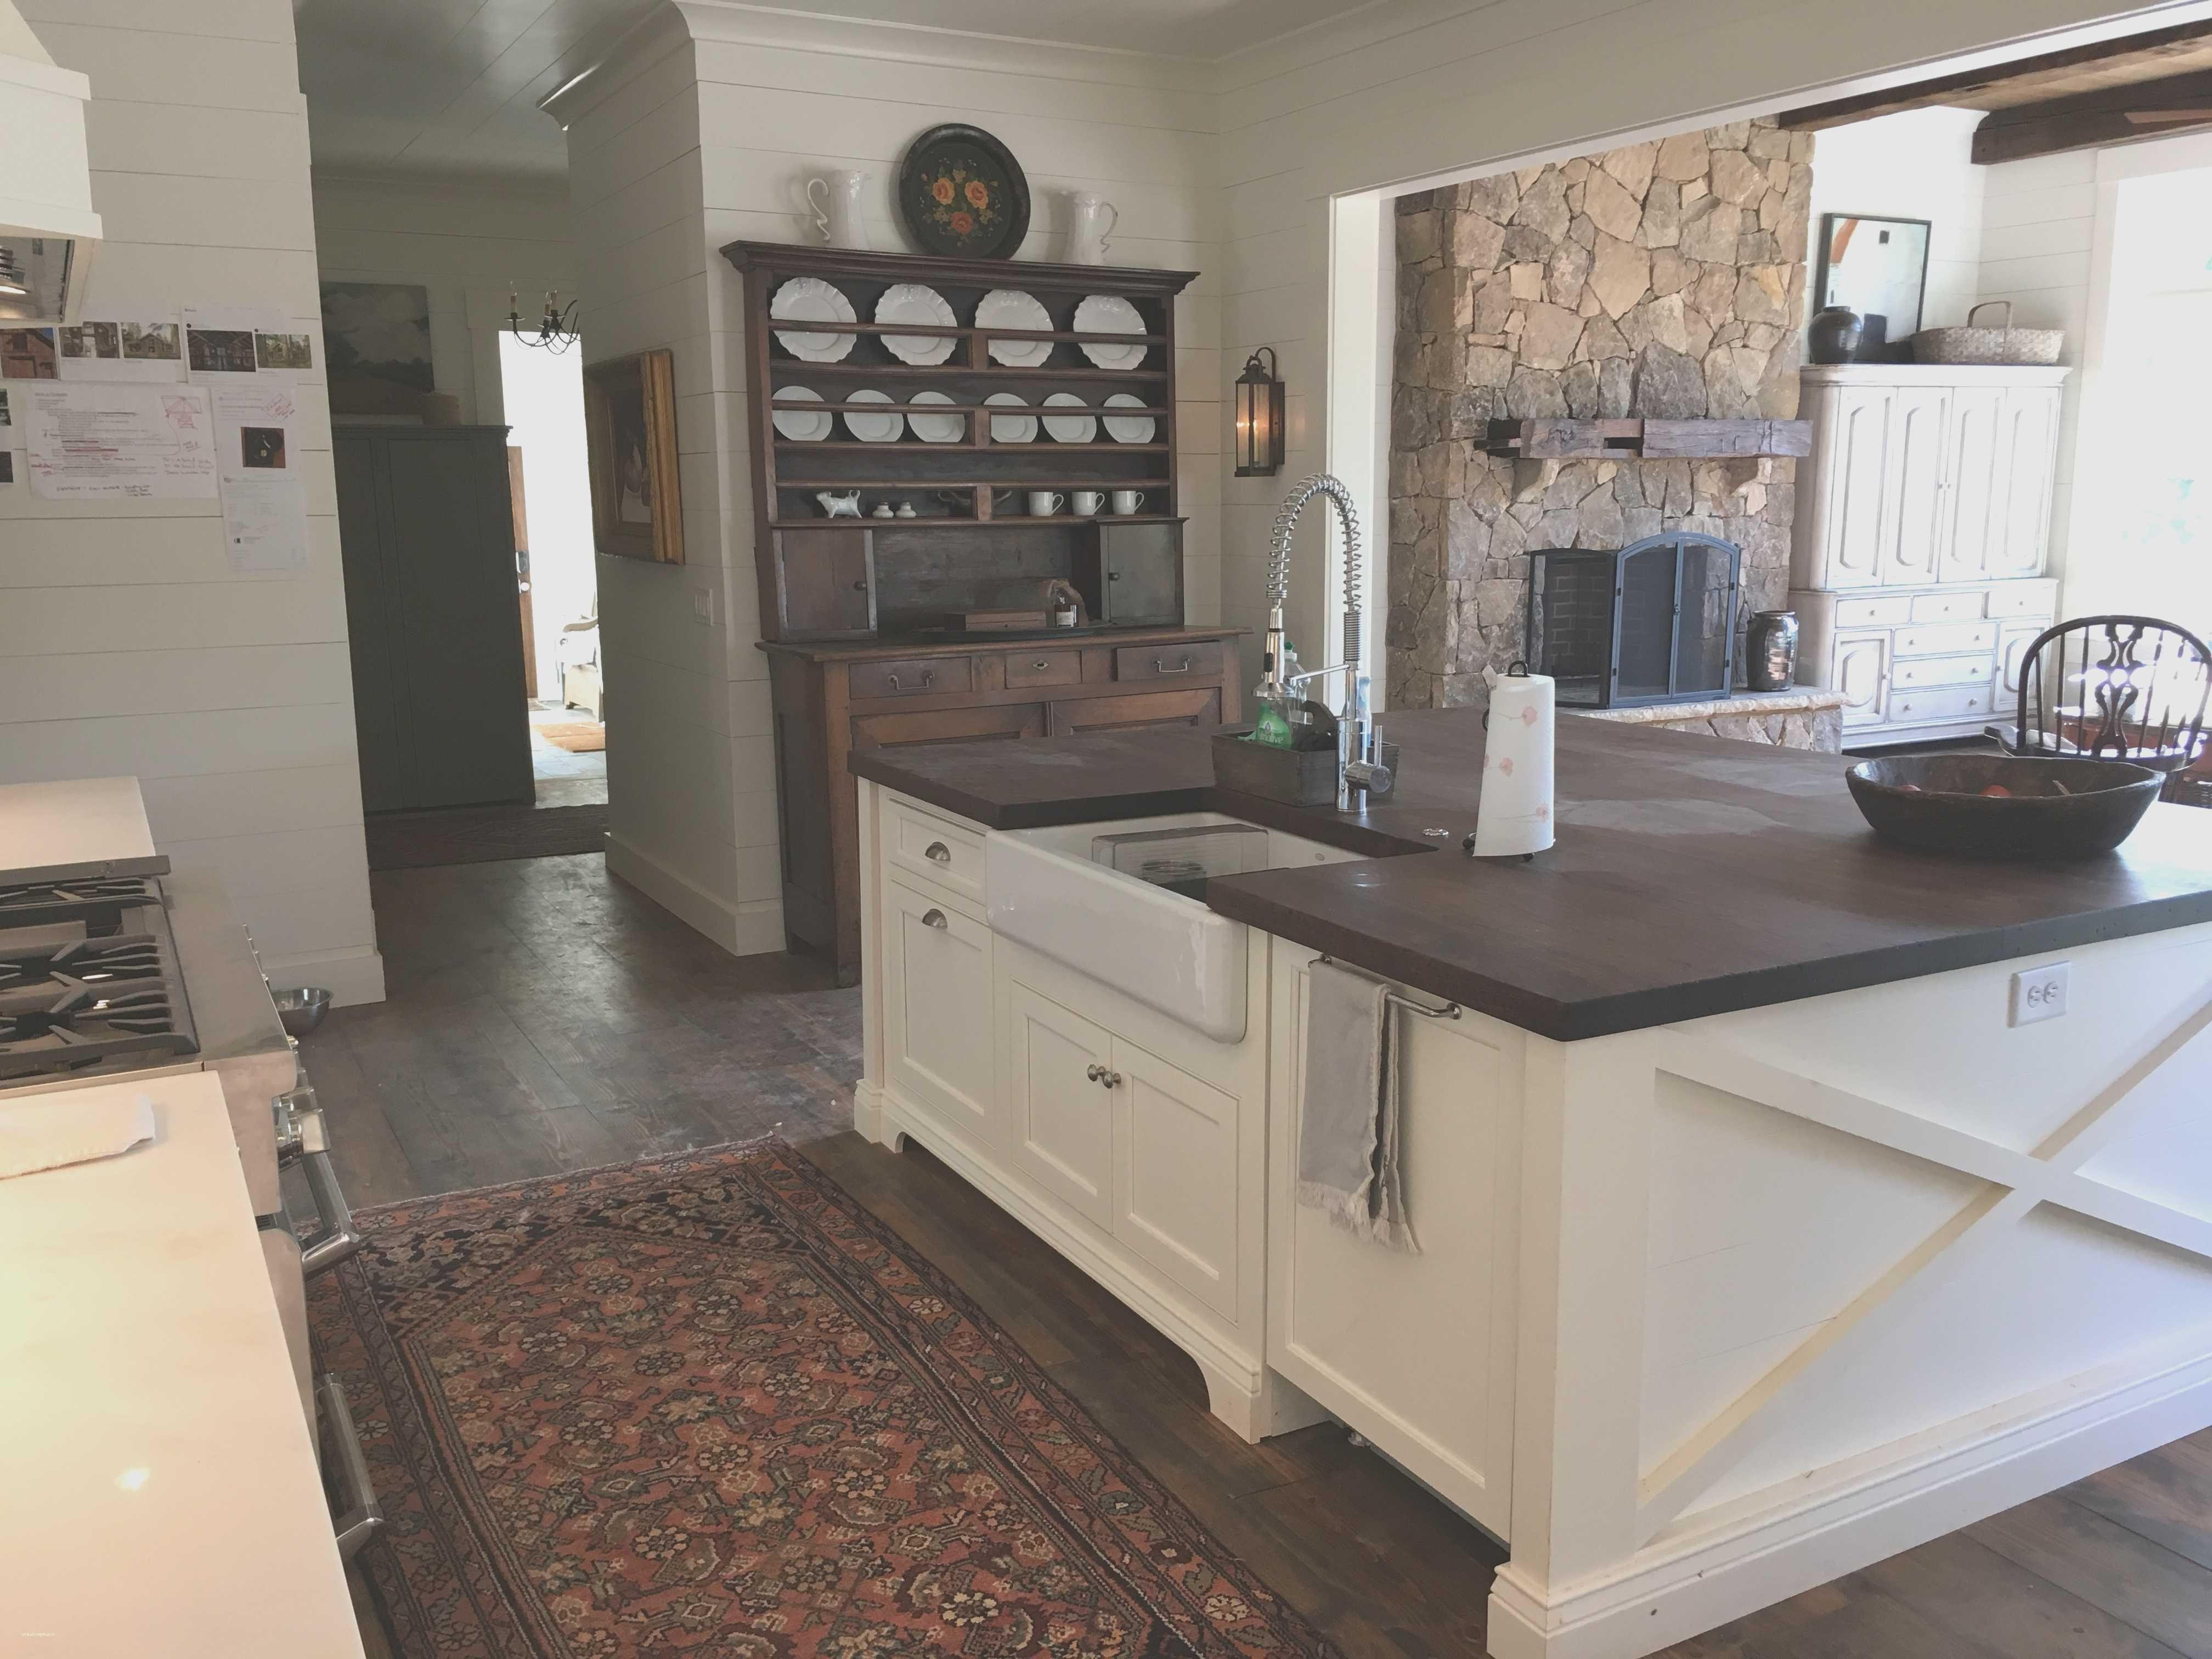 Best Kitchen Gallery: Lovely Farmhouse Kitchen Color Schemes Kitchen Color Schemes of Farmhouse Kitchen Paint Colors on rachelxblog.com